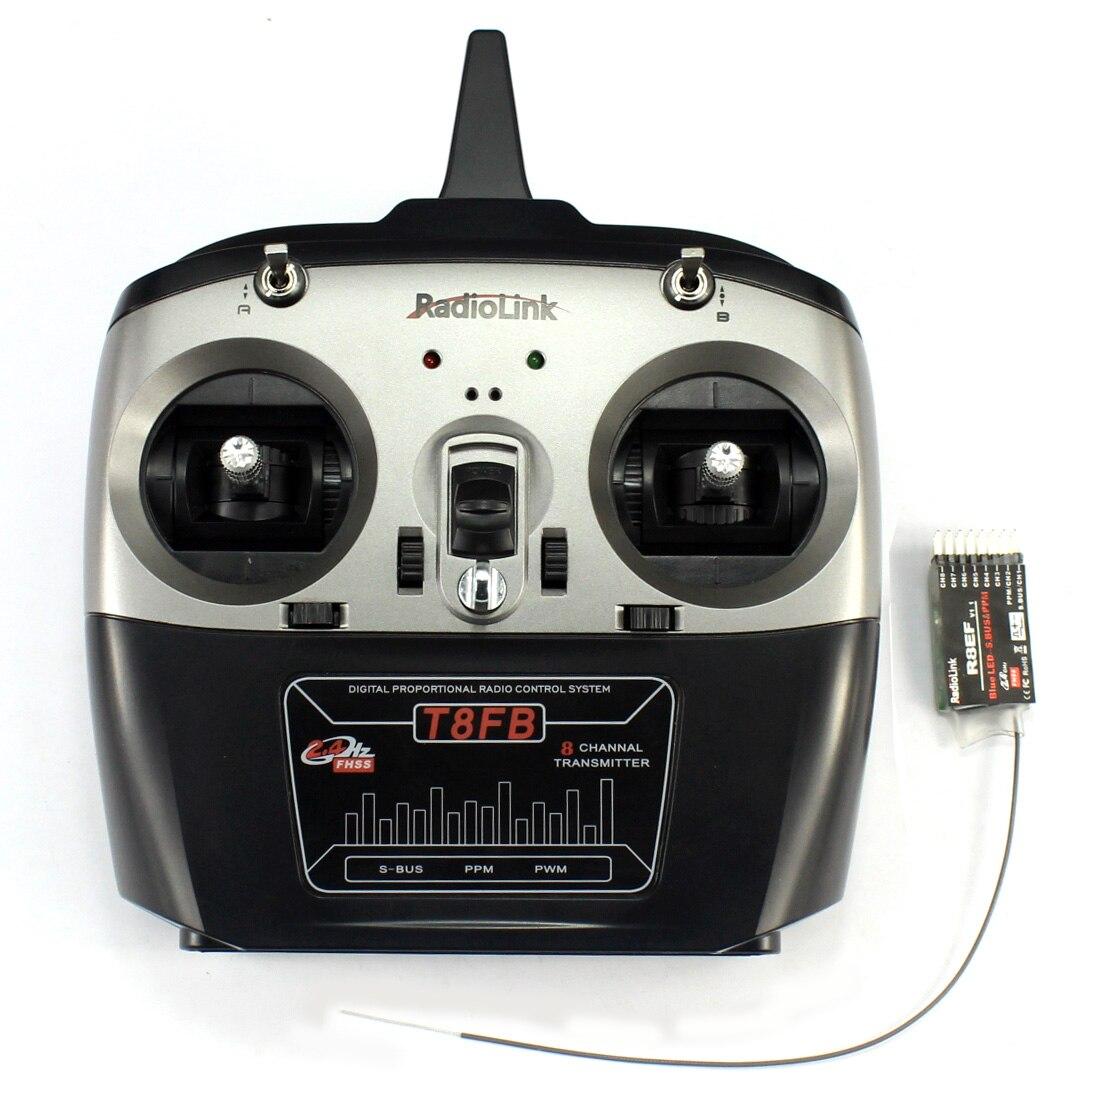 JMT 500mm Multi Rotor Air Frame Kit S500 w/Landingsgestel + ESC Motor Gelast + QQ SUPER Control Board + RX & TX + Propellers F08151 B - 5